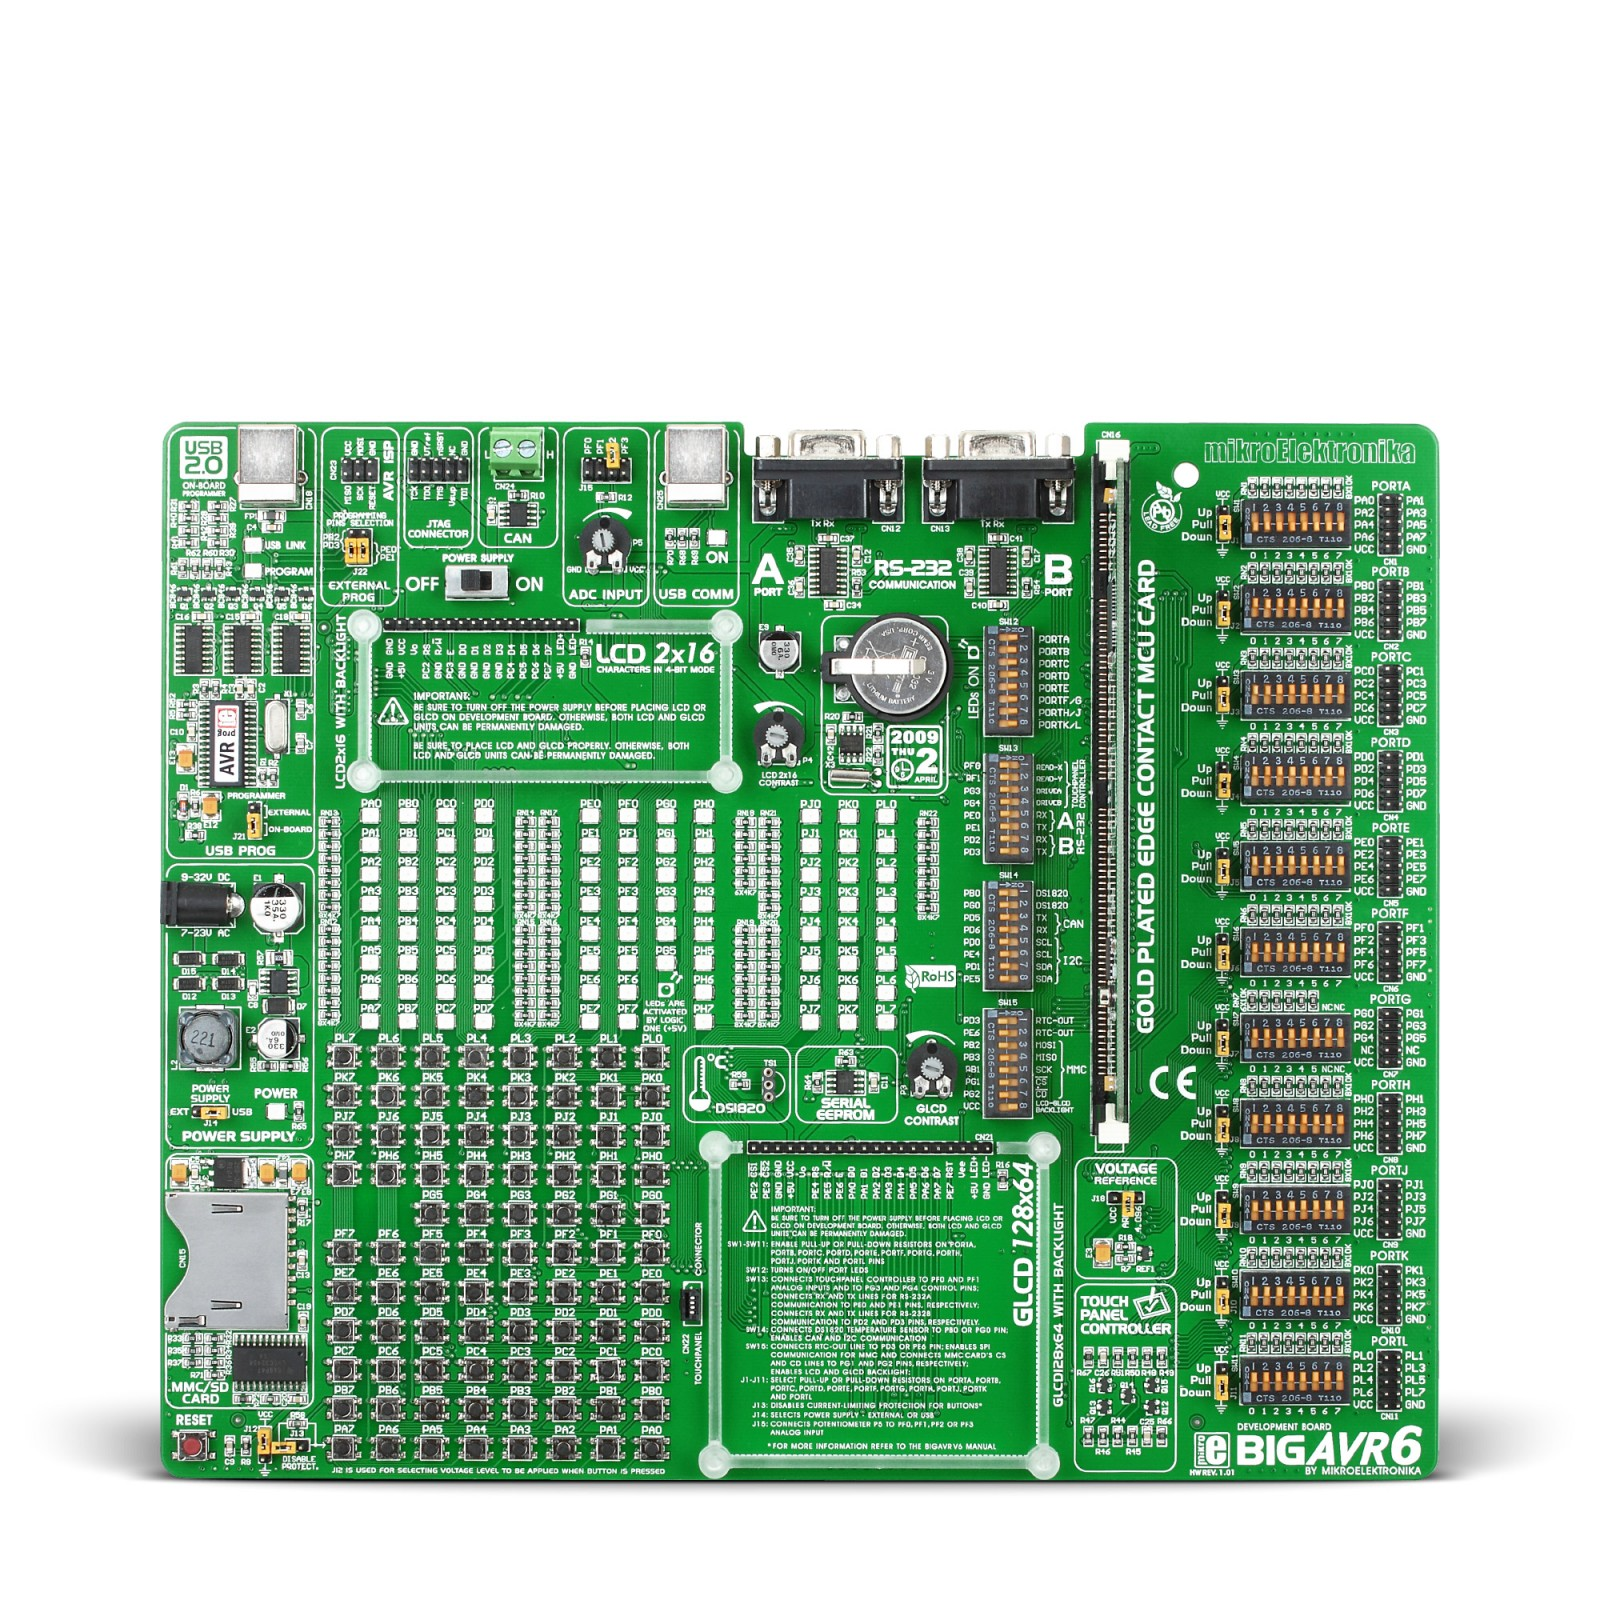 Bigavr6 Development System 64 100 Pin Avr Microcontroller Board Digilent Jtag Cable Schematic Usb Mgctlbxnmzp Mgctlbxv5112 Mgctlbxlc Mgctlbxpprestashop